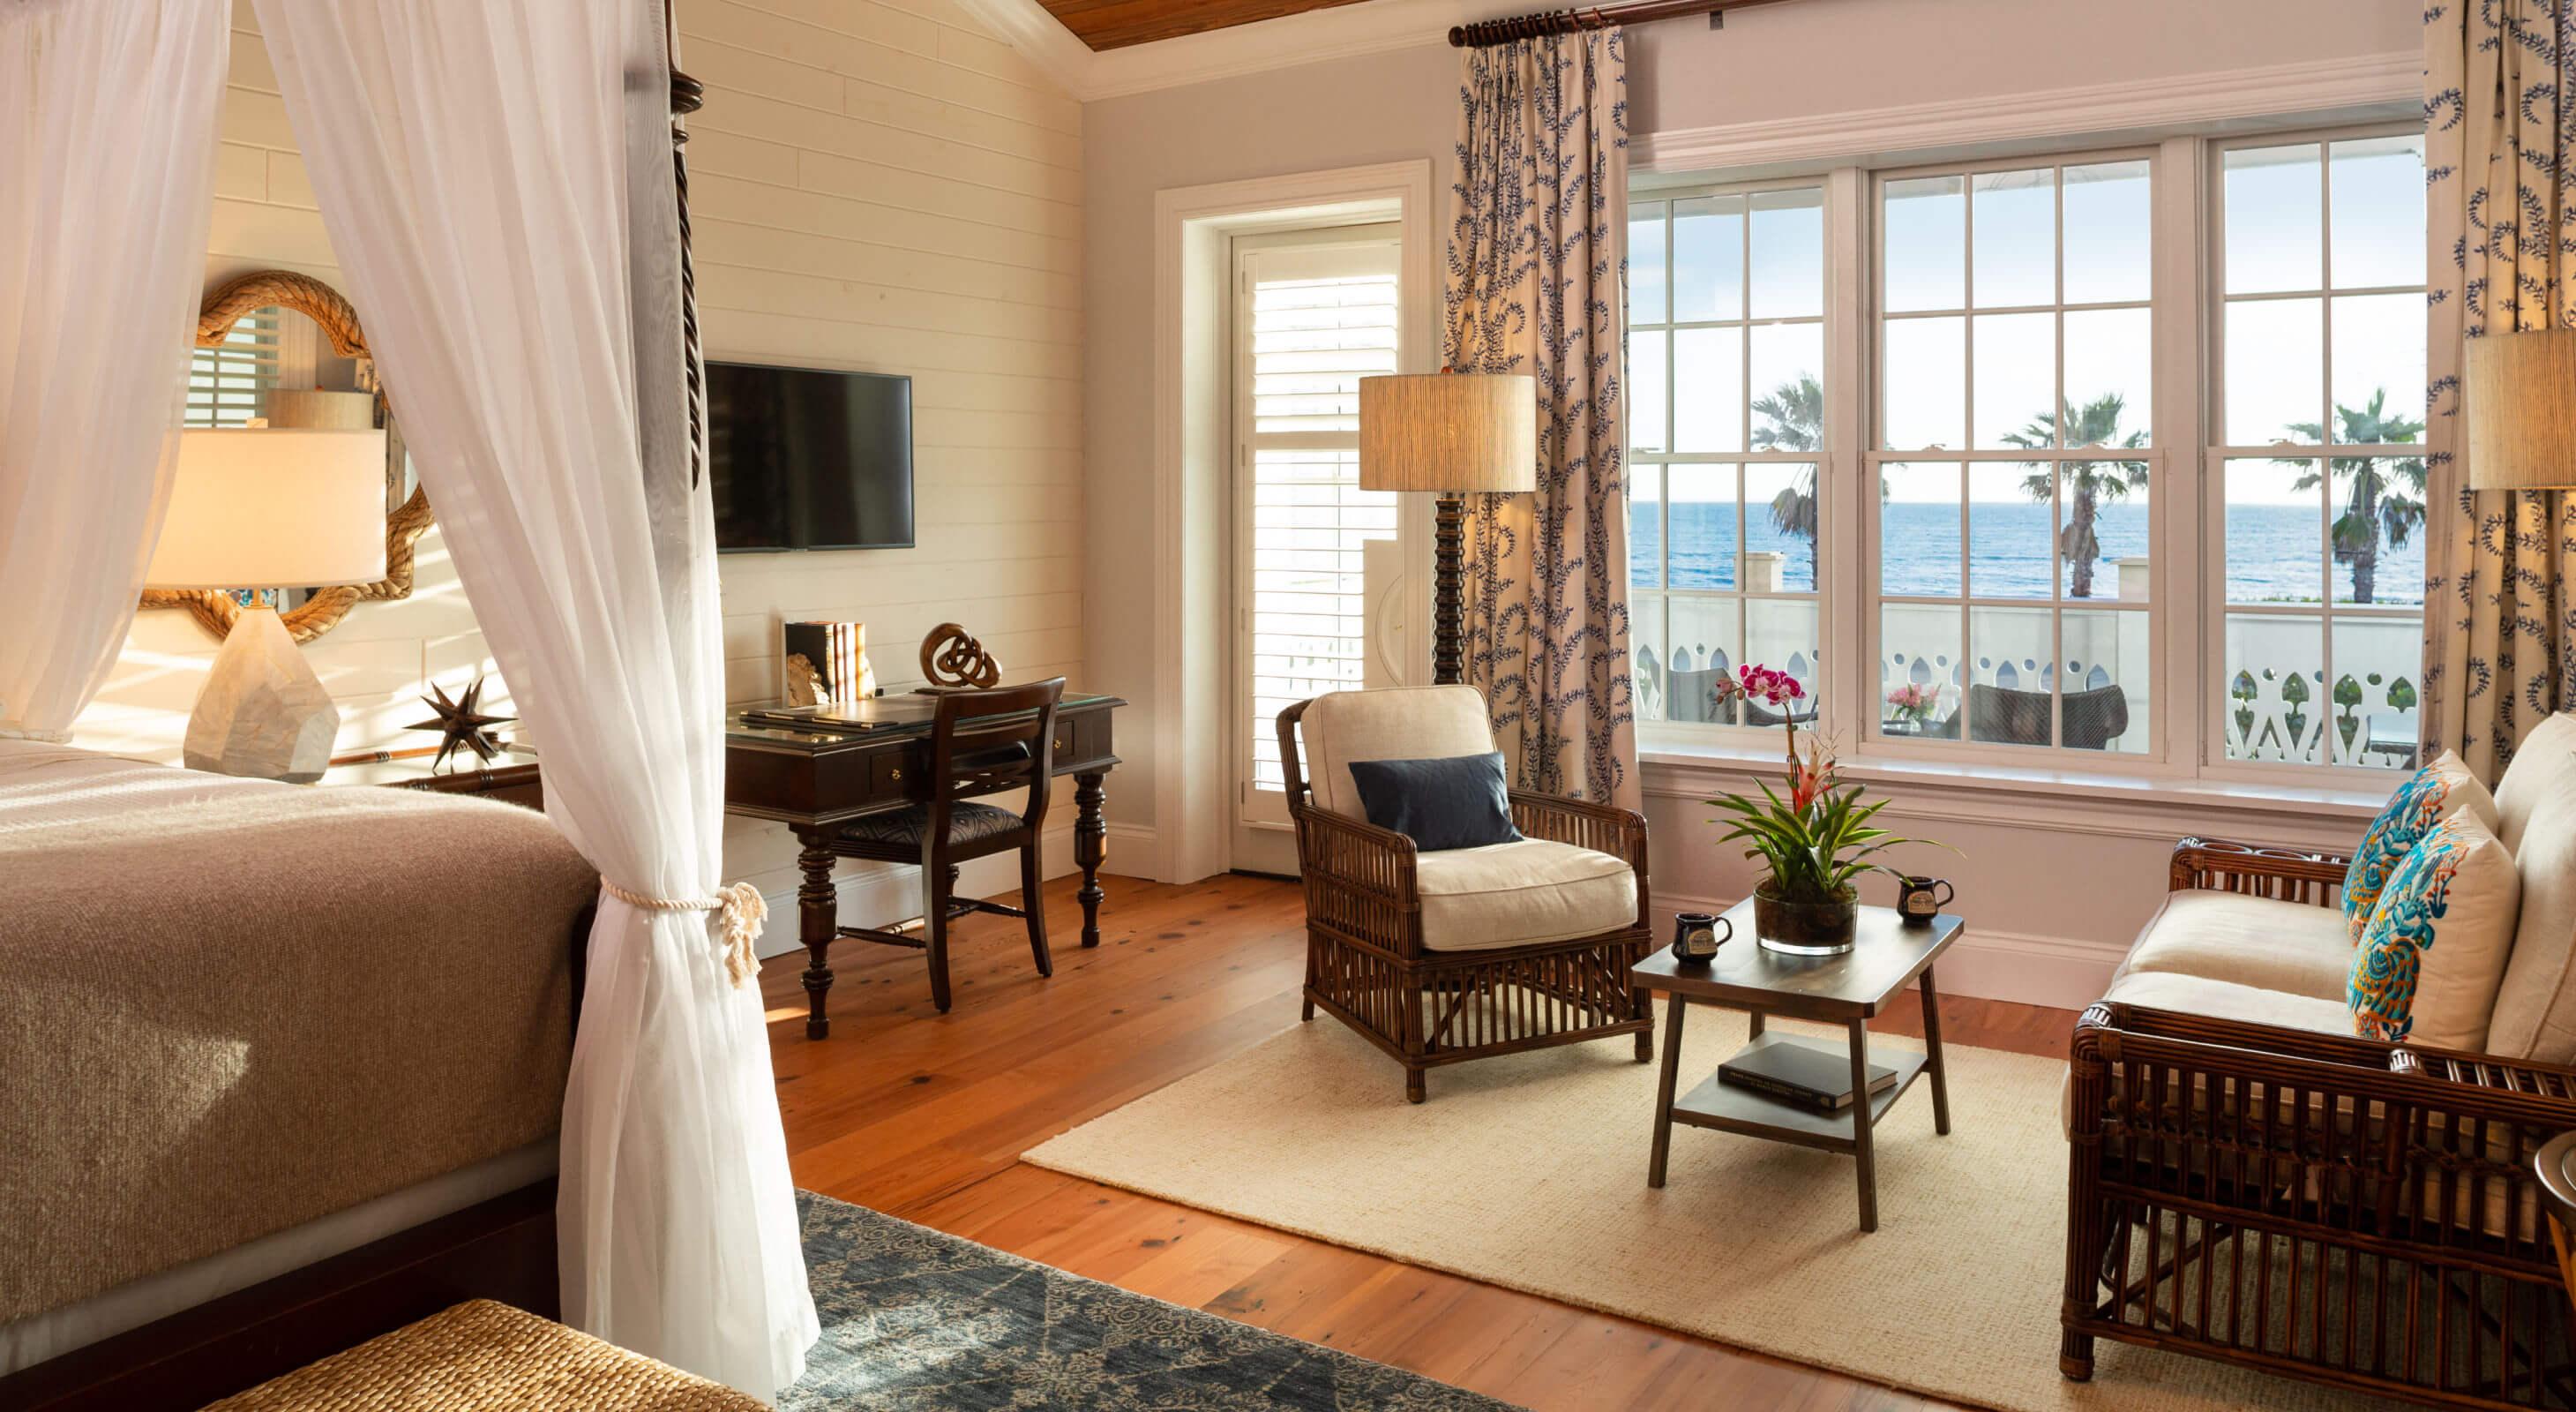 Website Designs by White Stone Marketing - luxury florida hotel room